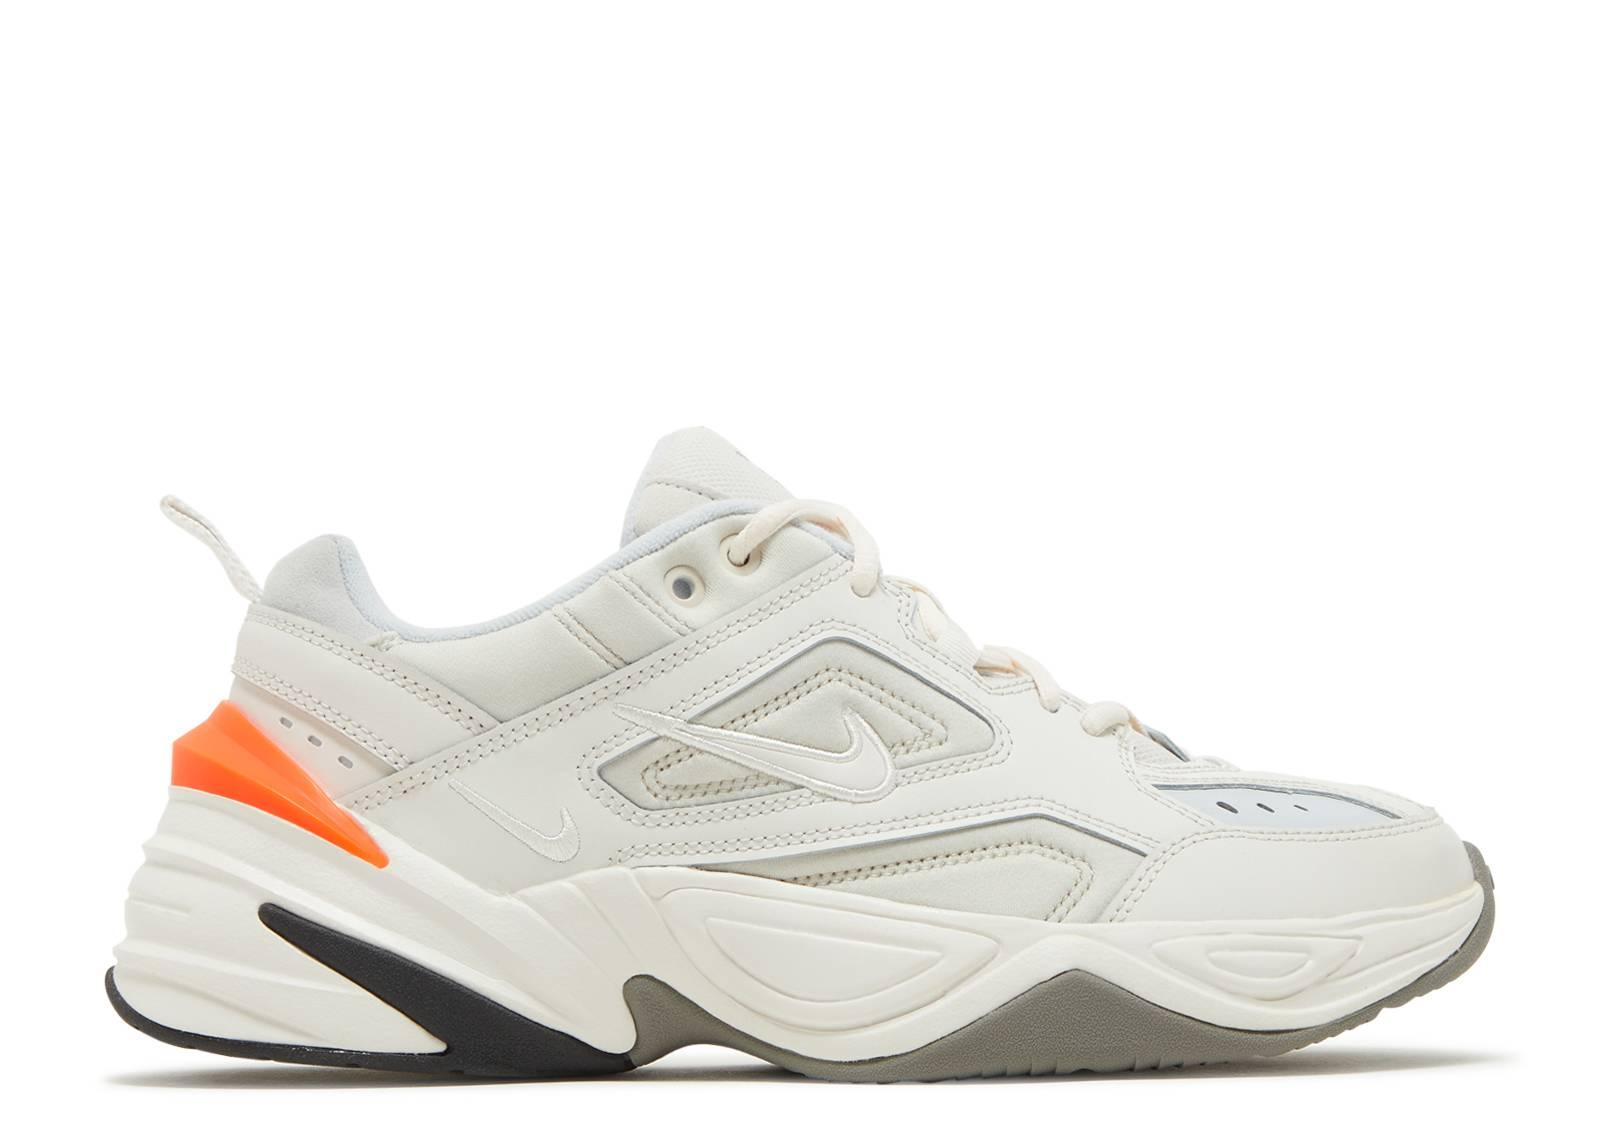 bc1a9e2f53ffa9 Nike M2k Tekno